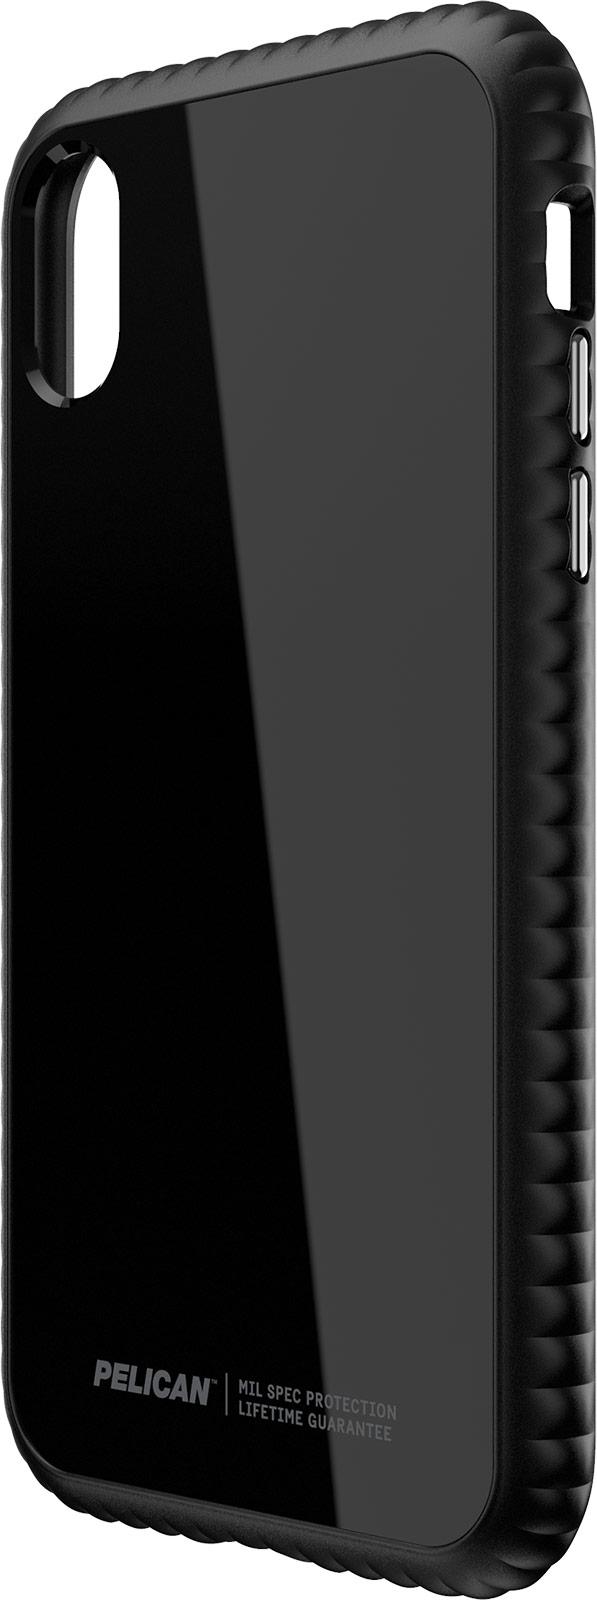 pelican iphone apple c42160 guardian clear mobile phone case